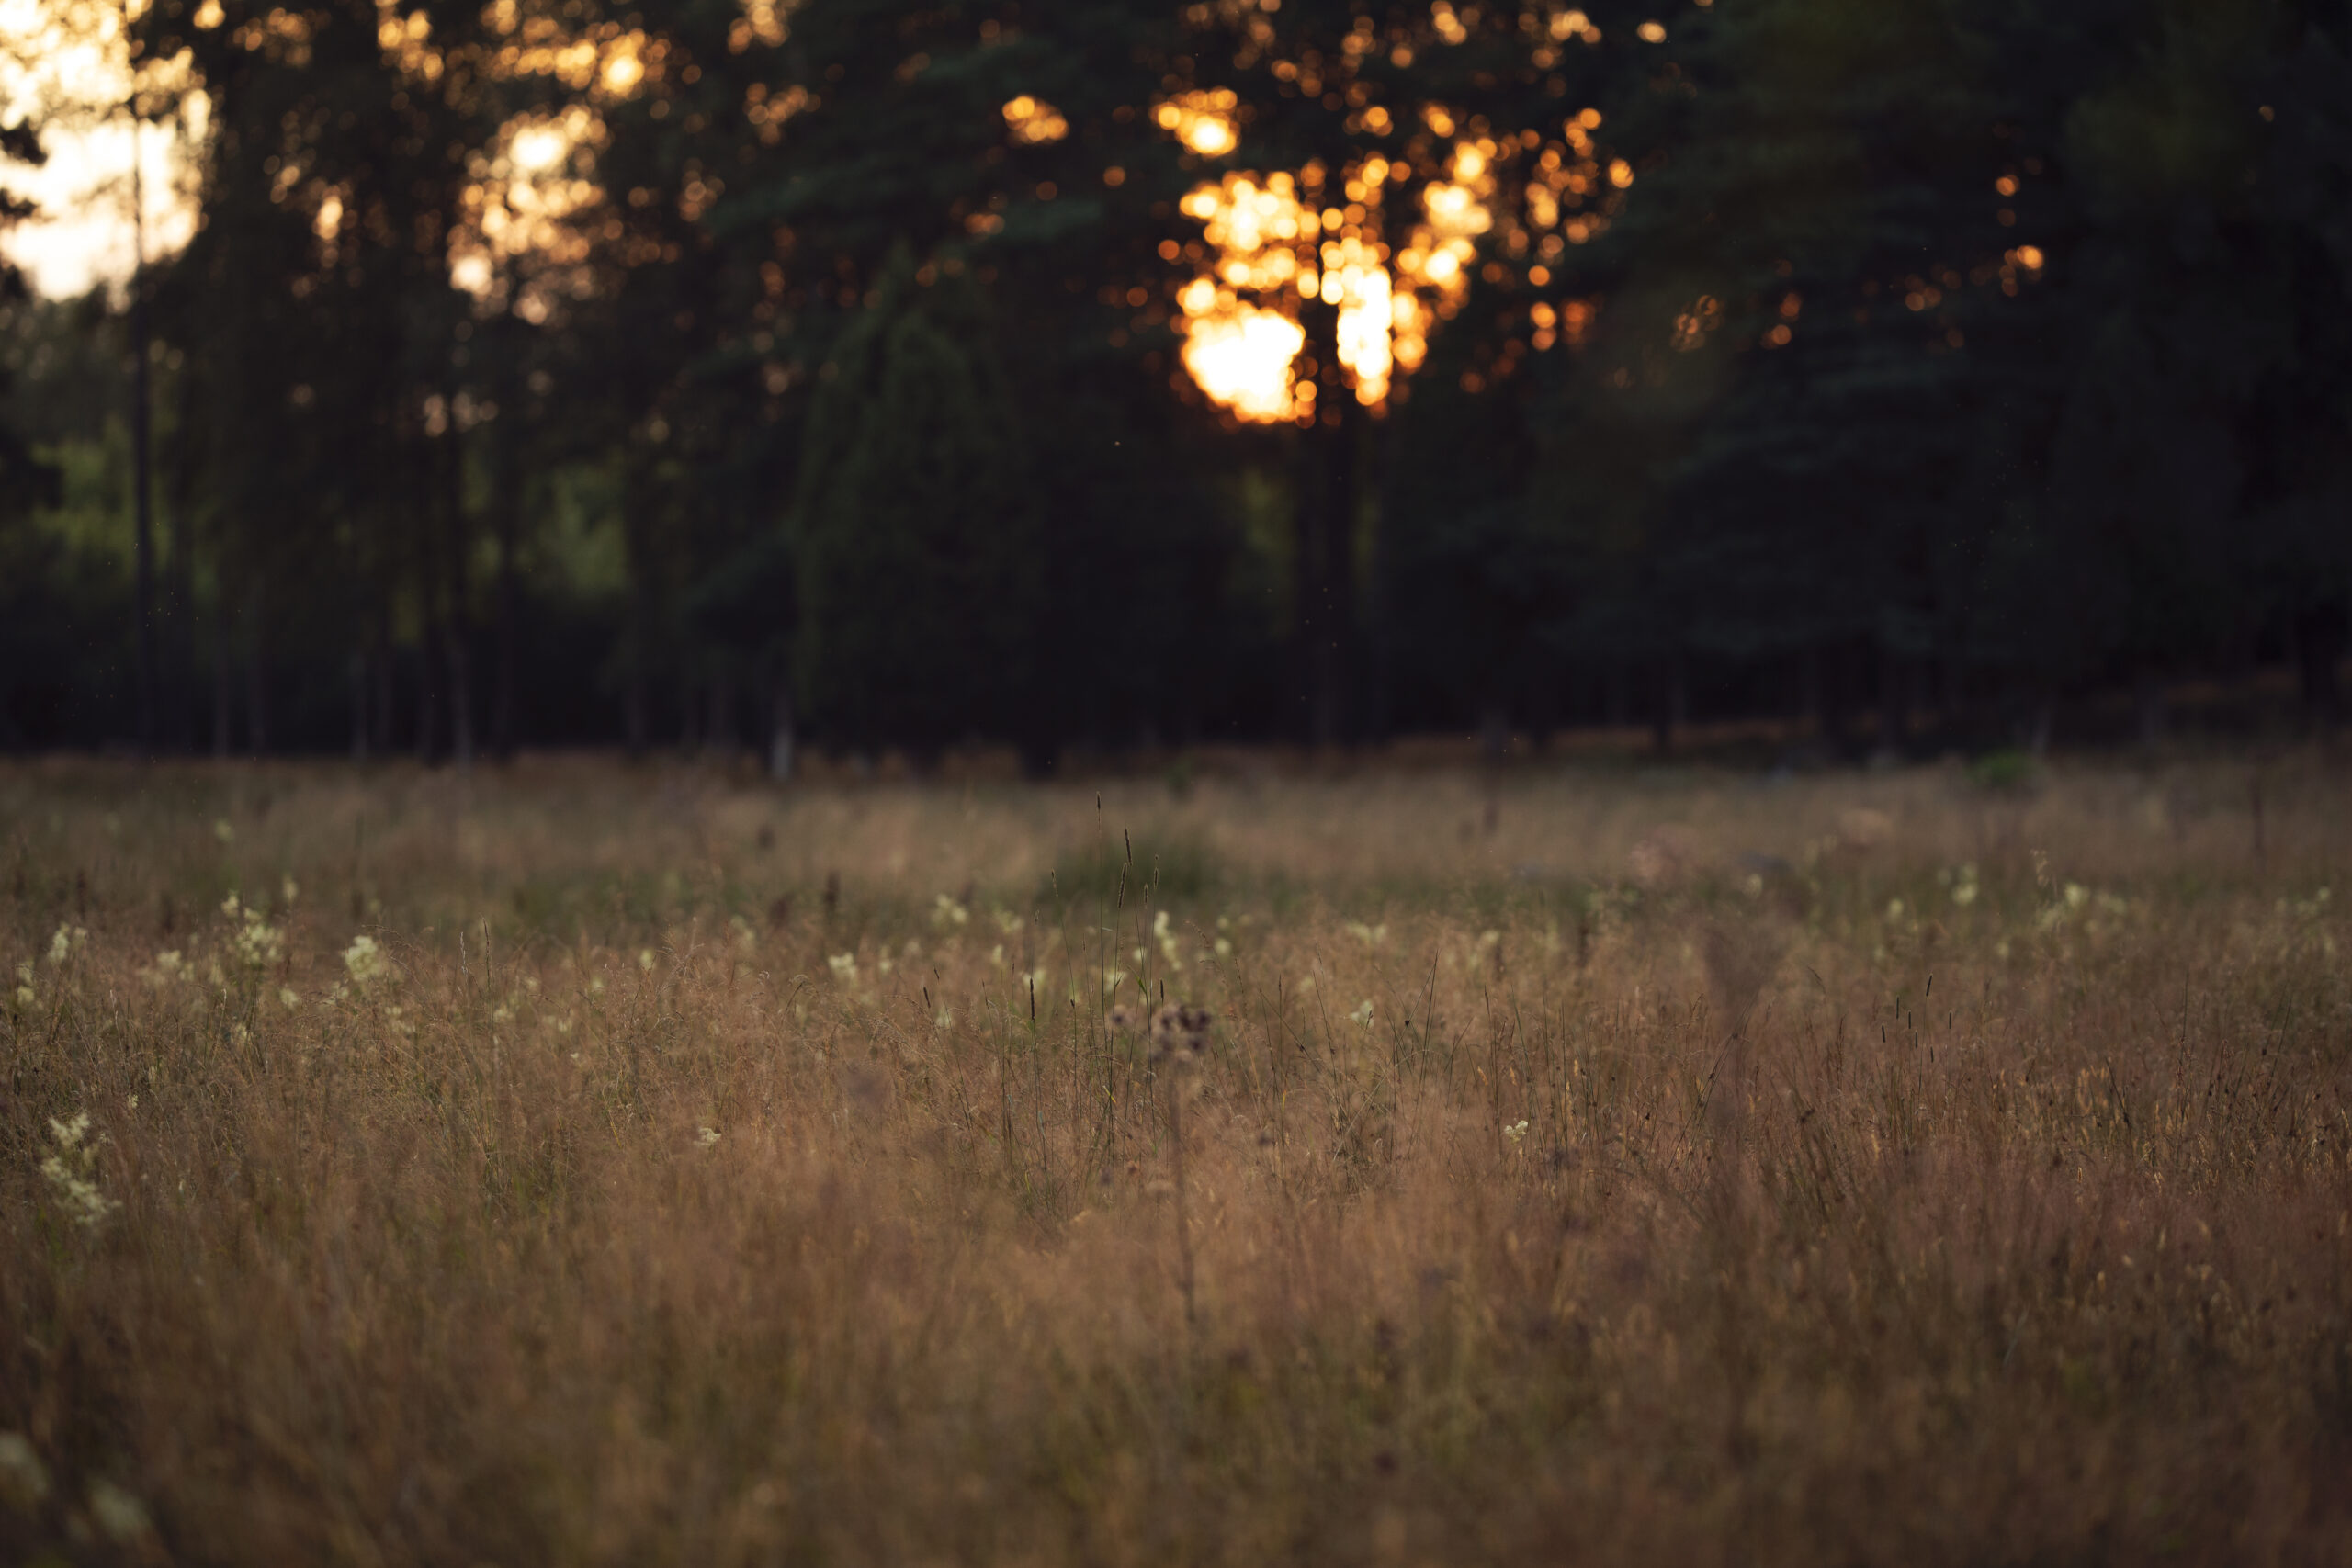 sun setting by summer field